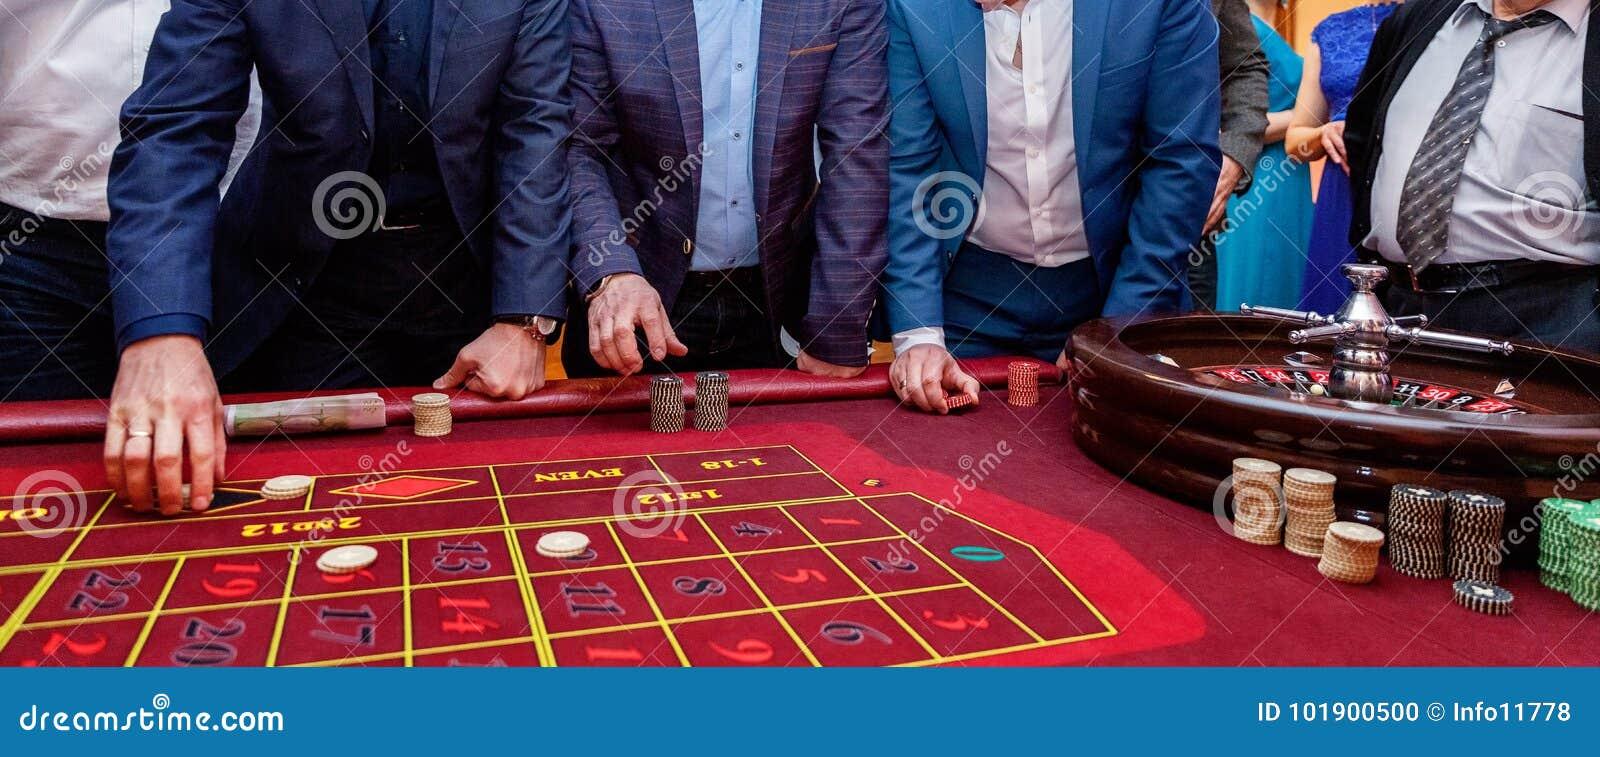 Tabelle mit Rouletten